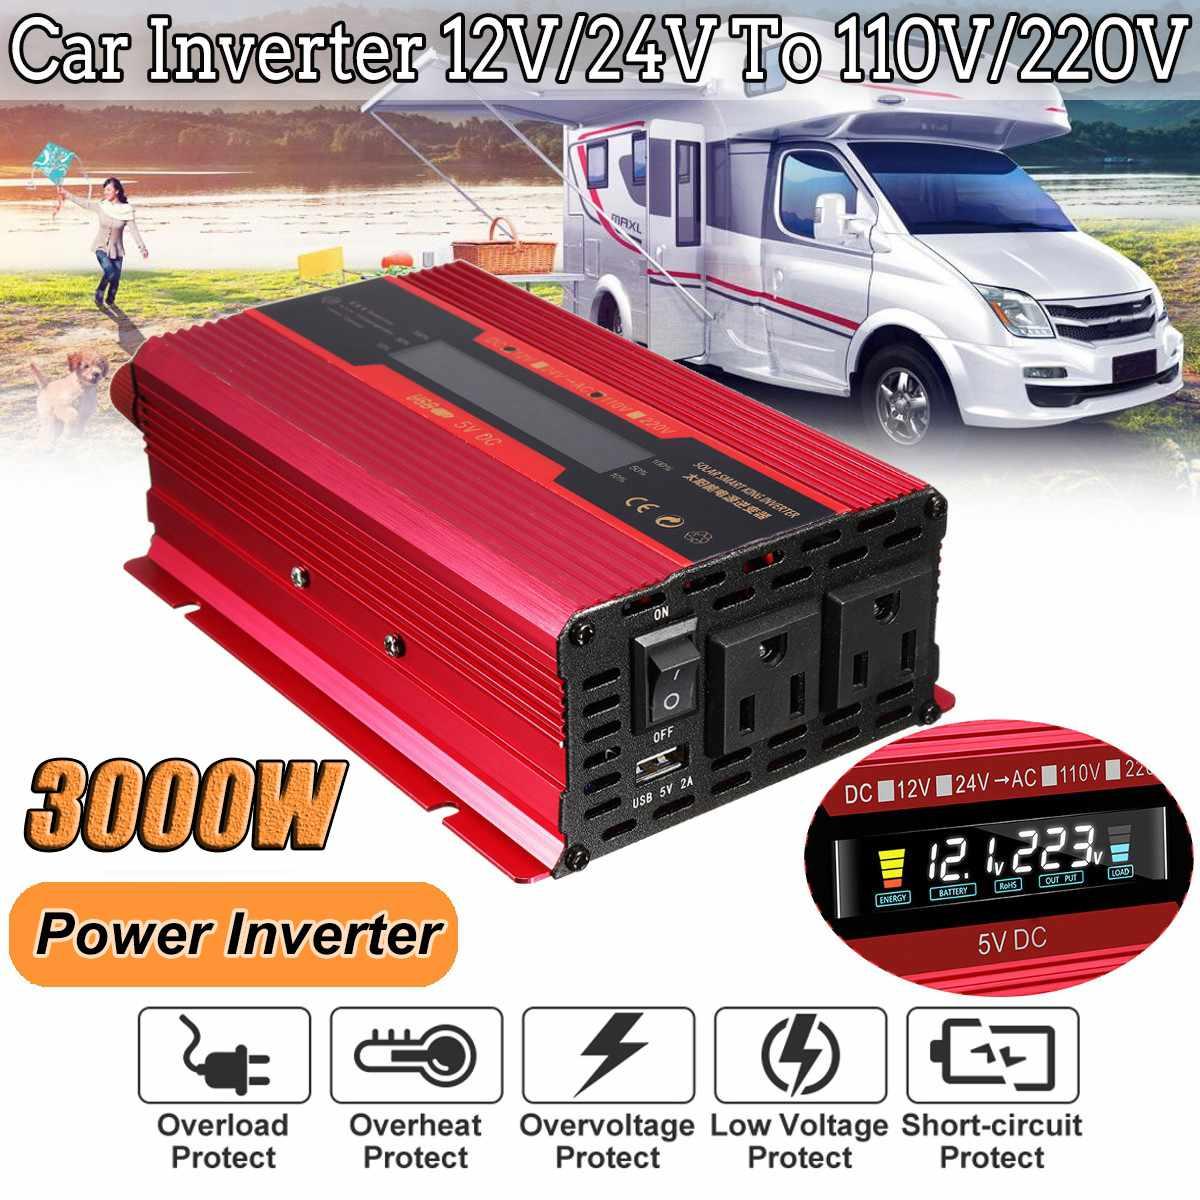 Autoleader Lcd-Display Truck Solar-Power-Inverter 3000W 110V/220V 12v/24v for Car Aluminum-Alloy